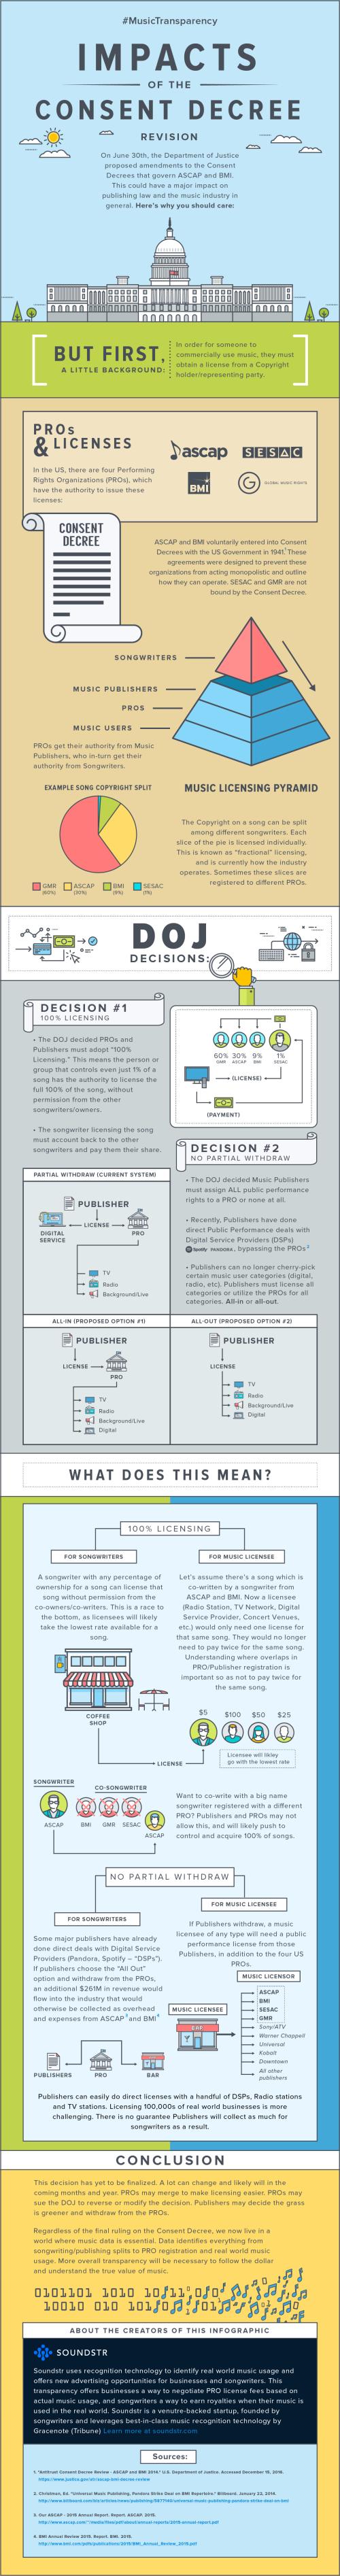 Soundstr_Consent_Decree_Infographic